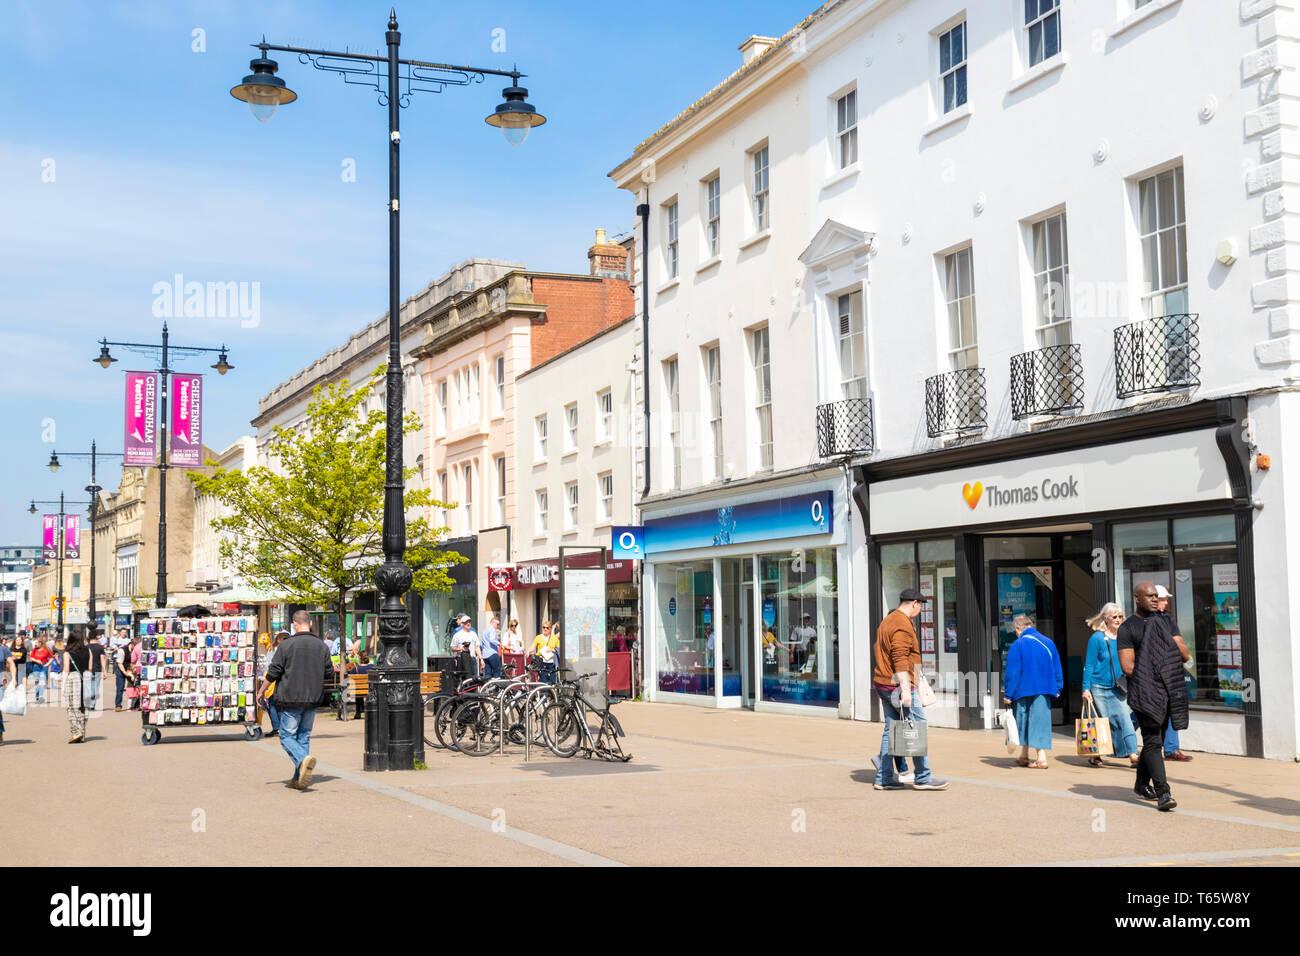 Cheltenham high street cheltenham shopping Shoppers on the High Street, Cheltenham Spa, Gloucestershire, England, UK, EU, Europe - Stock Image